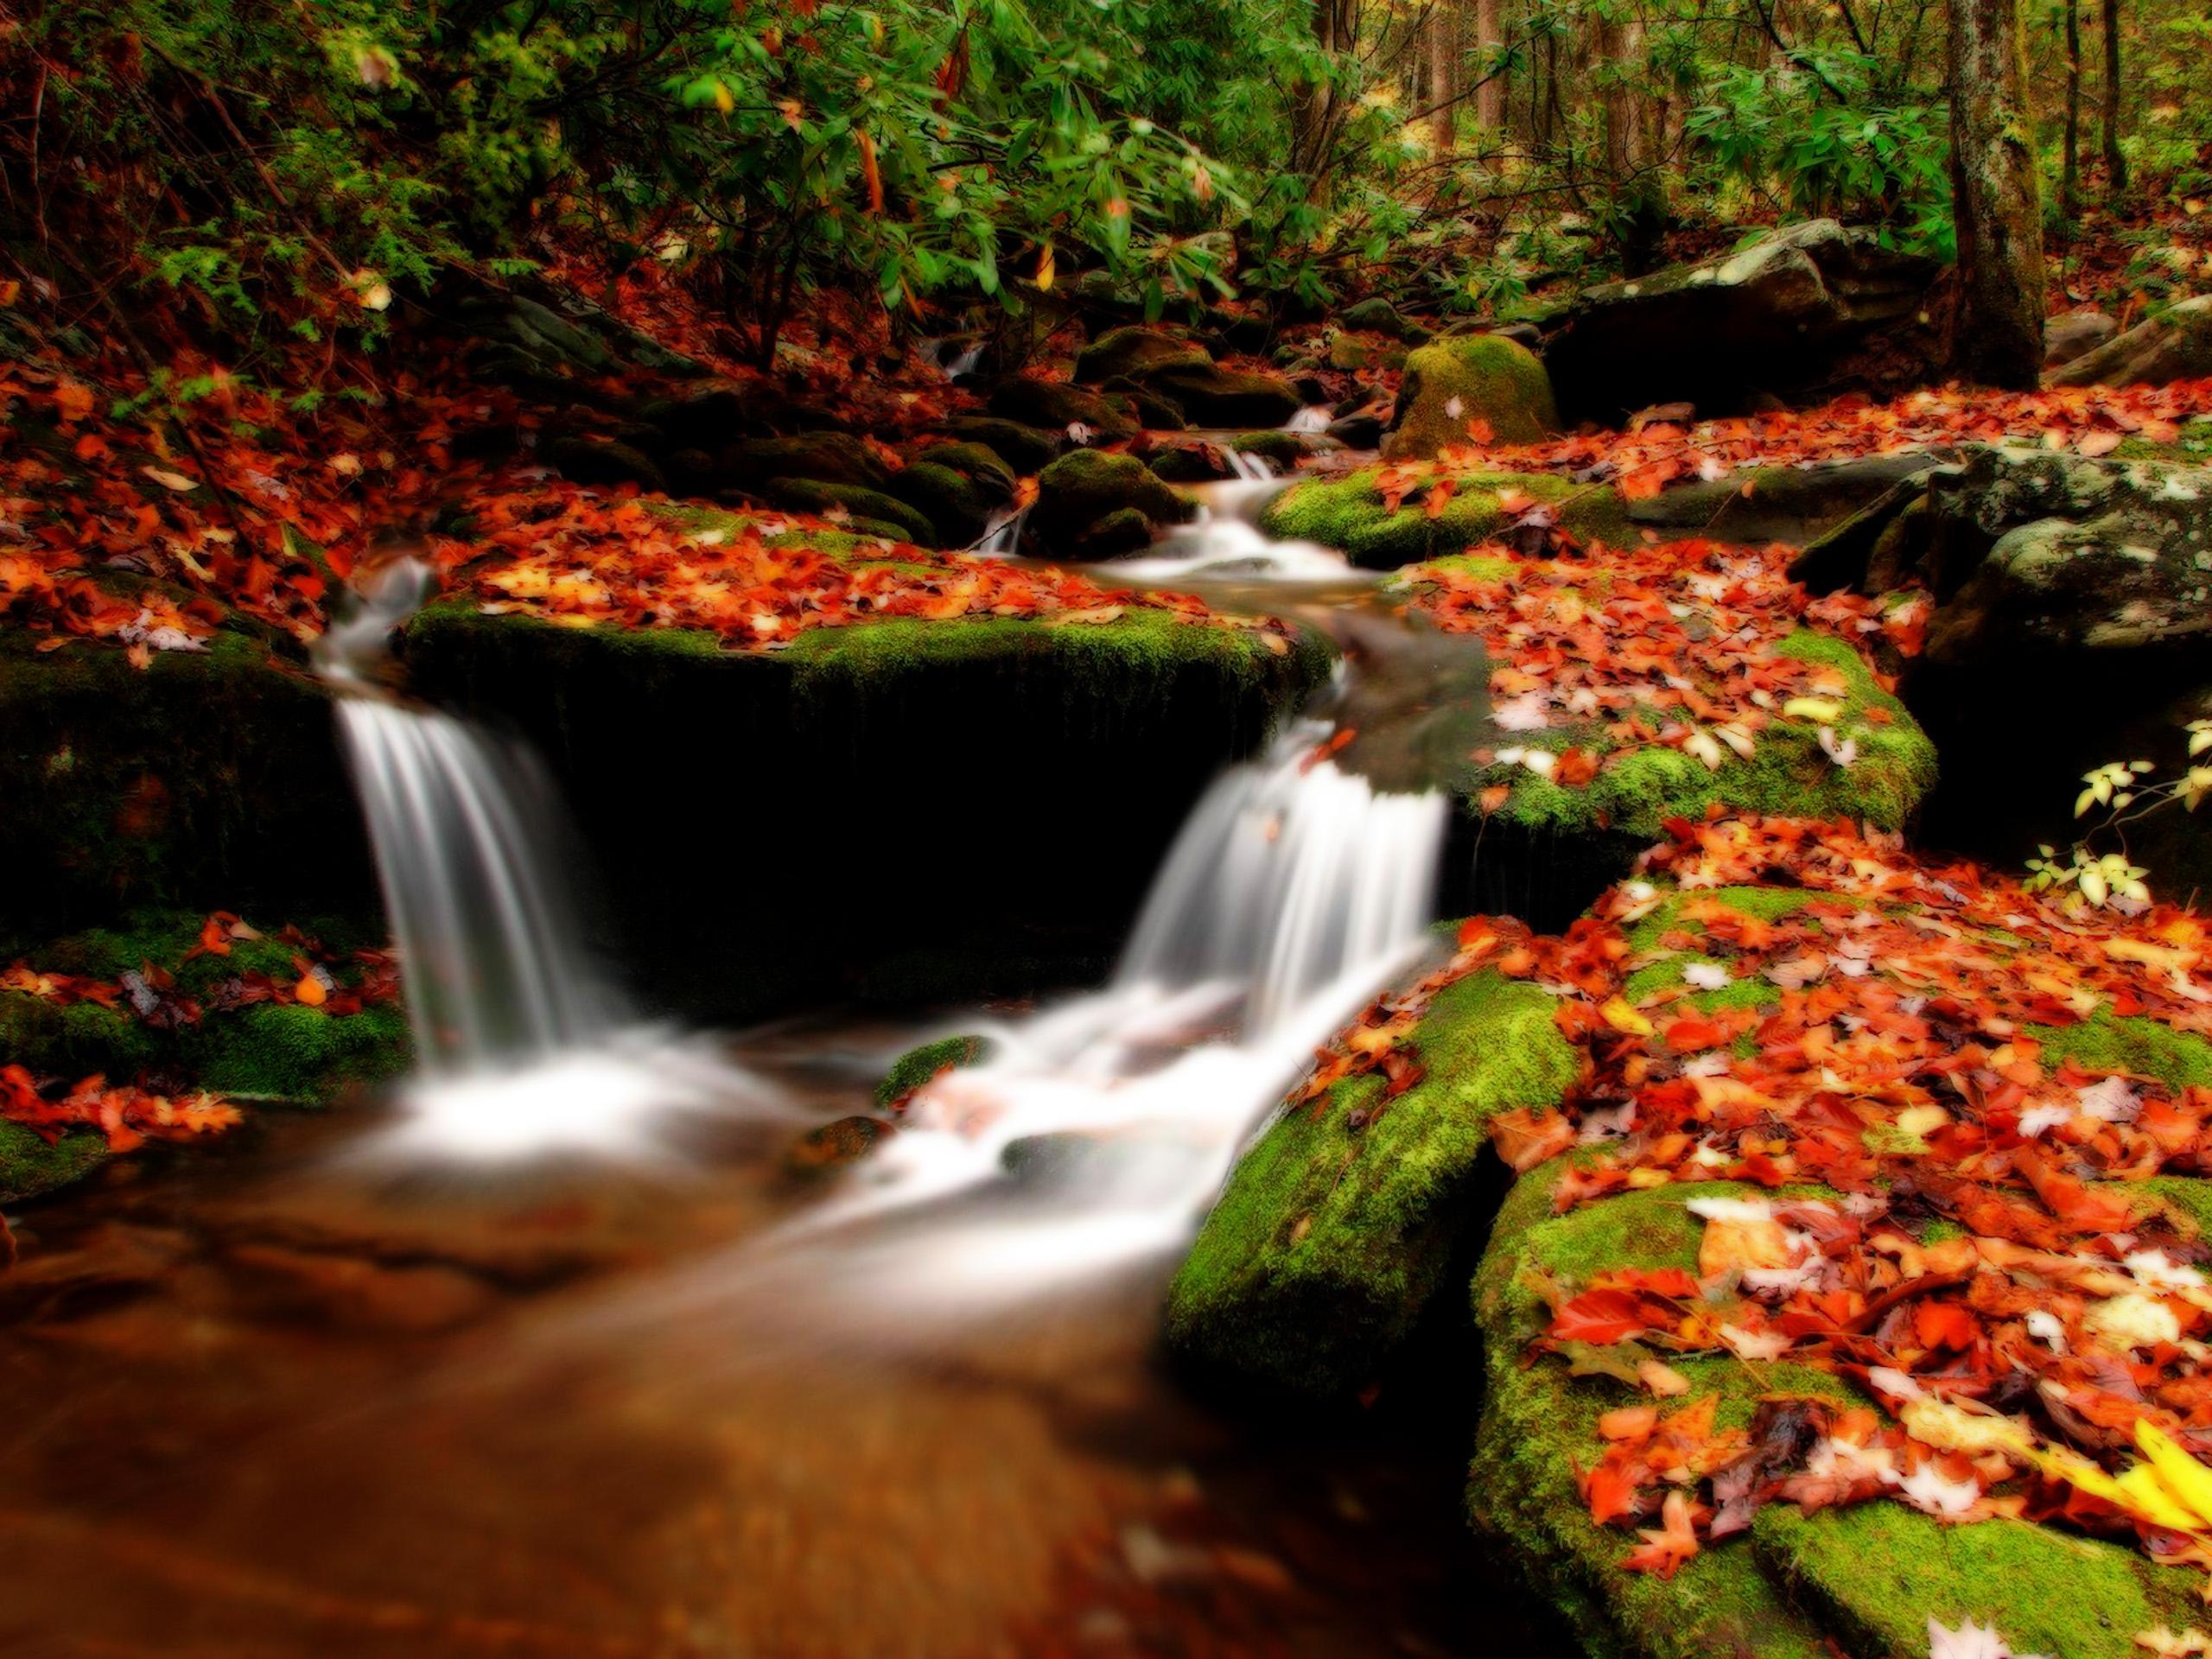 autumn desktop wallpaper windows 7   wwwwallpapers in hdcom 2560x1920